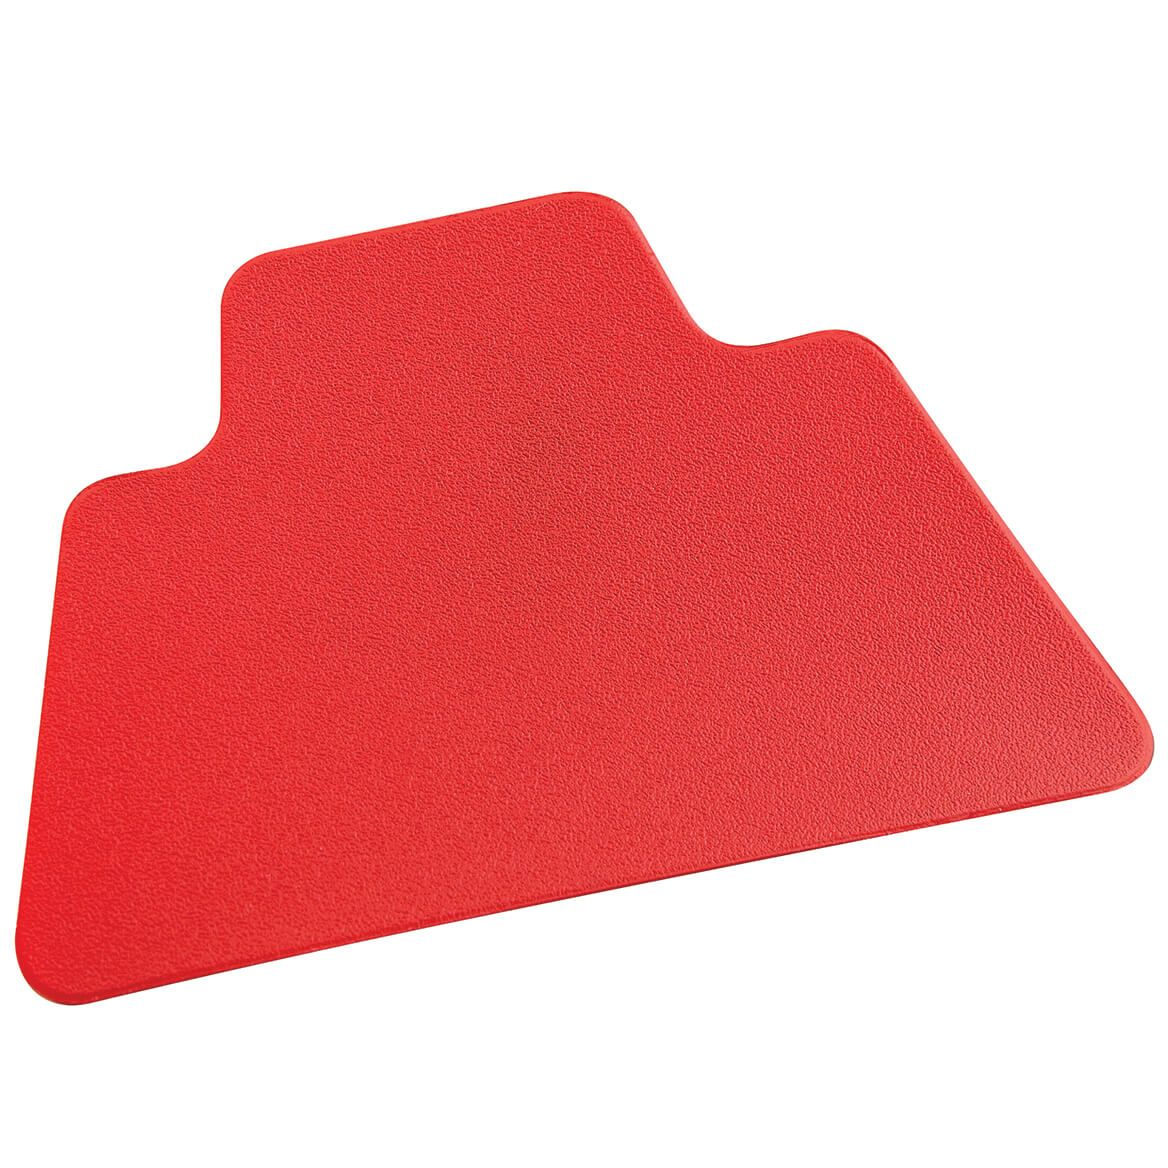 Cra-Z-Art Puzzle Glue with Spreader, 4.5 oz.-372203